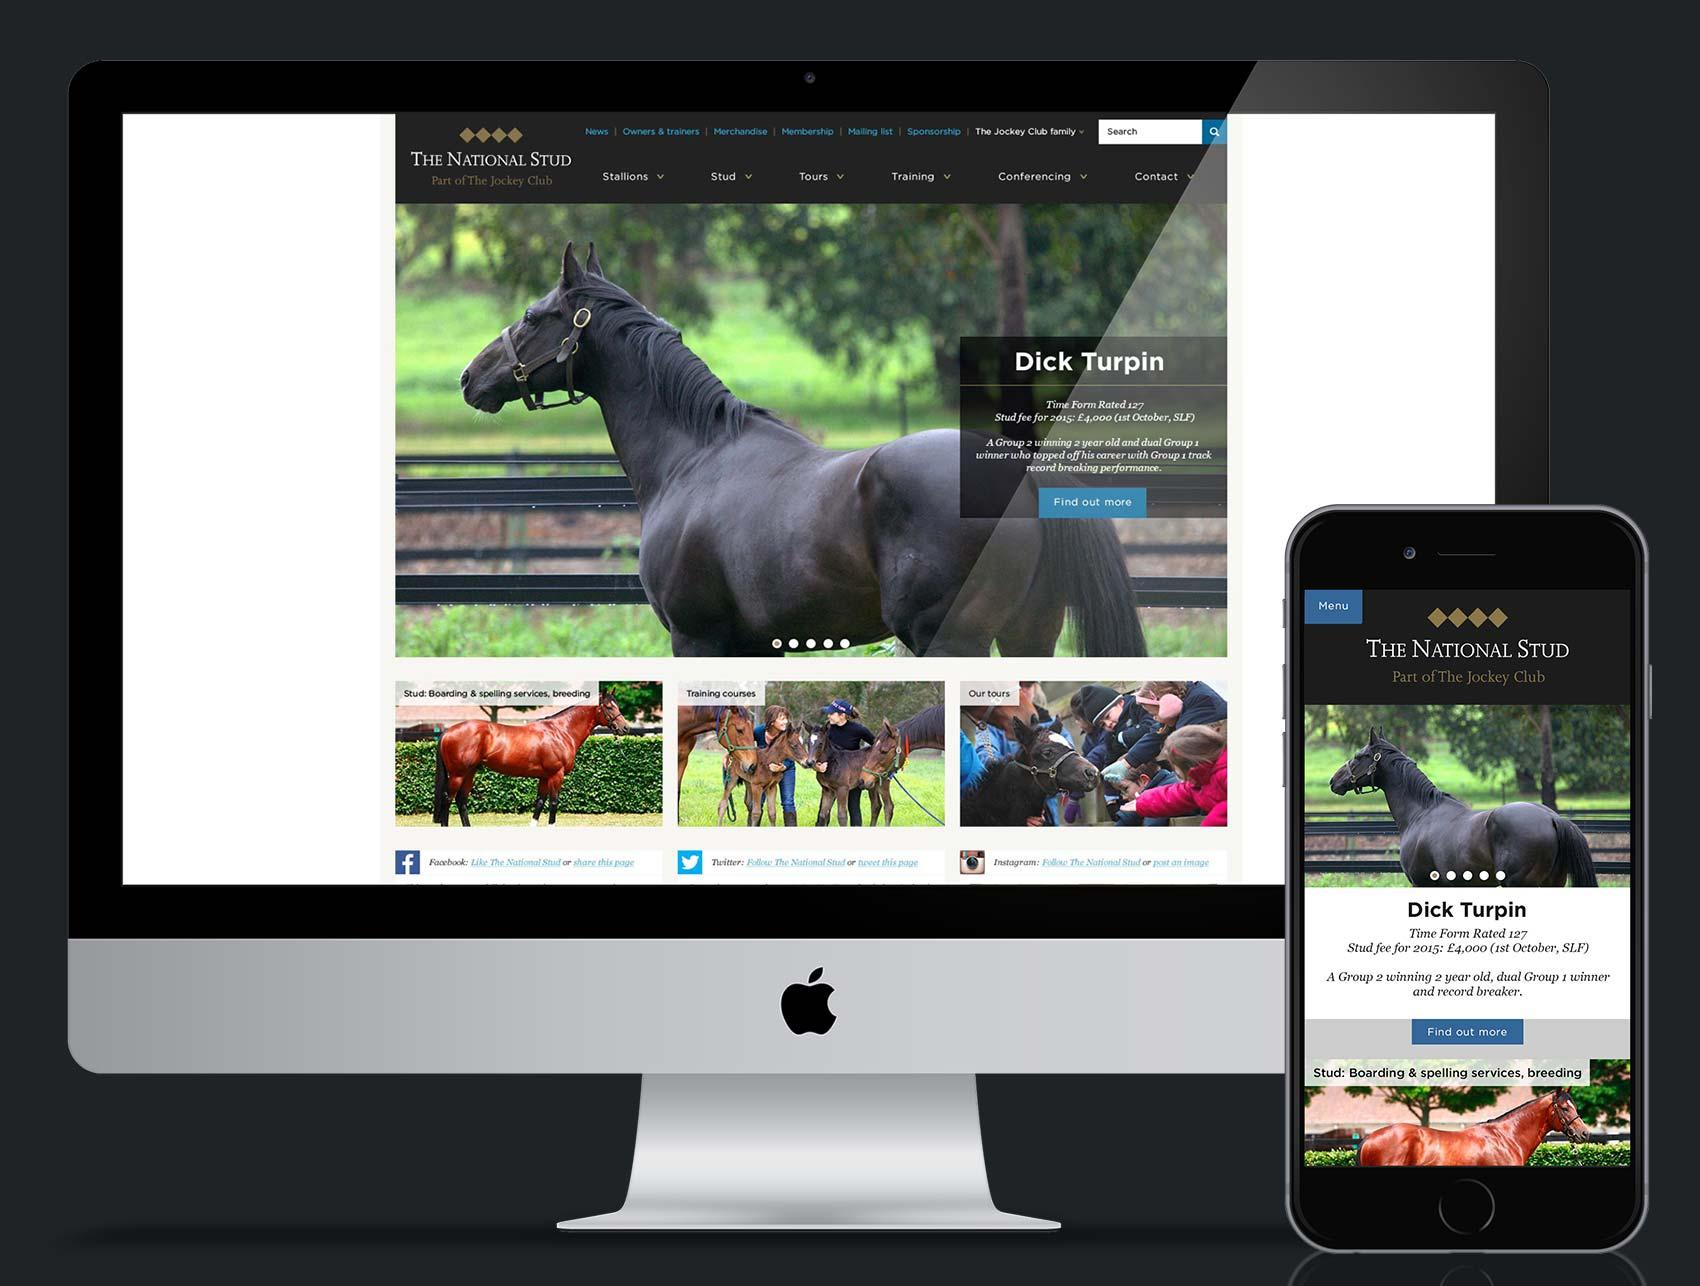 Jockey Club - National Stud Website Redesign